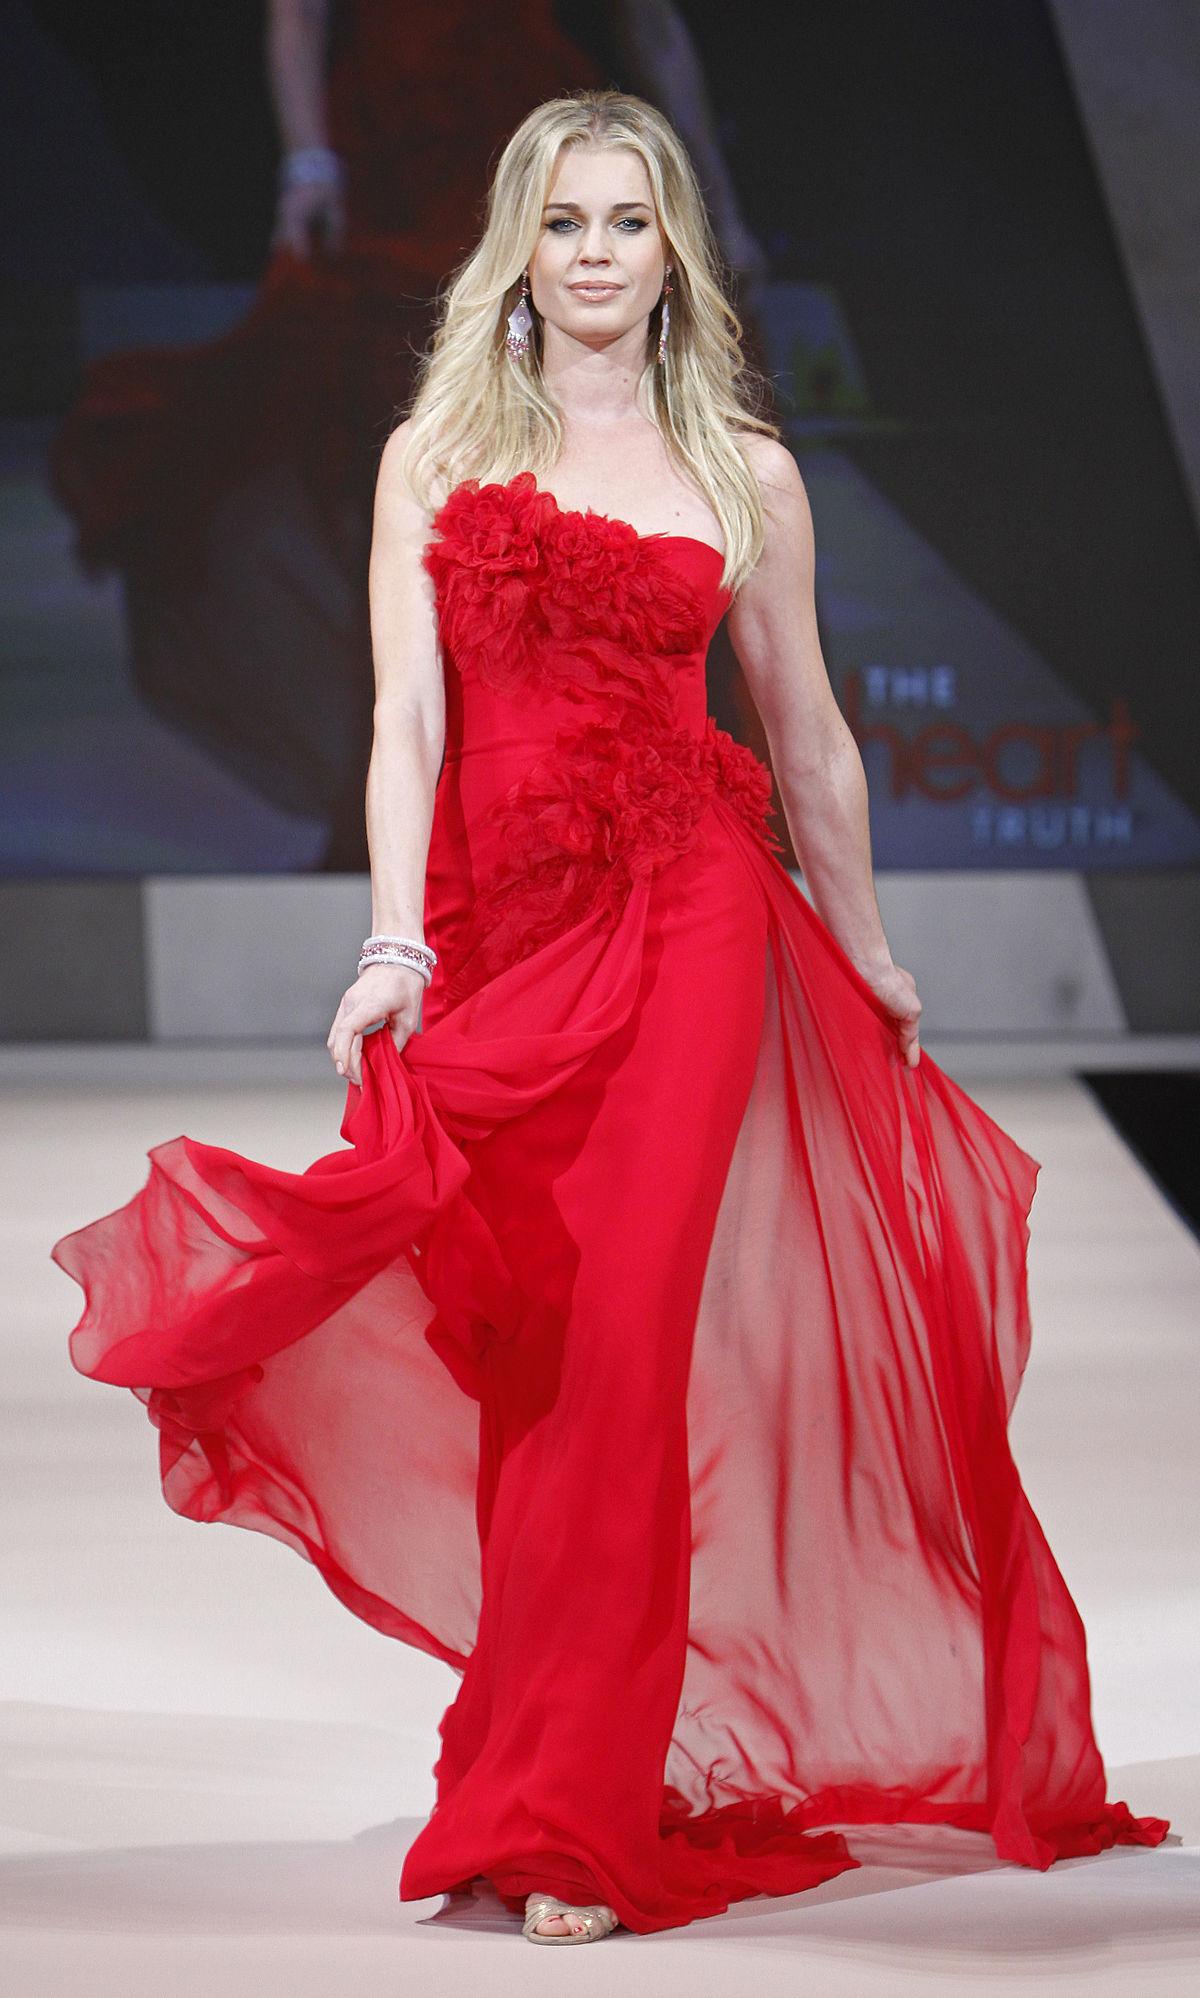 Rebecca Romijn - Wikipedia